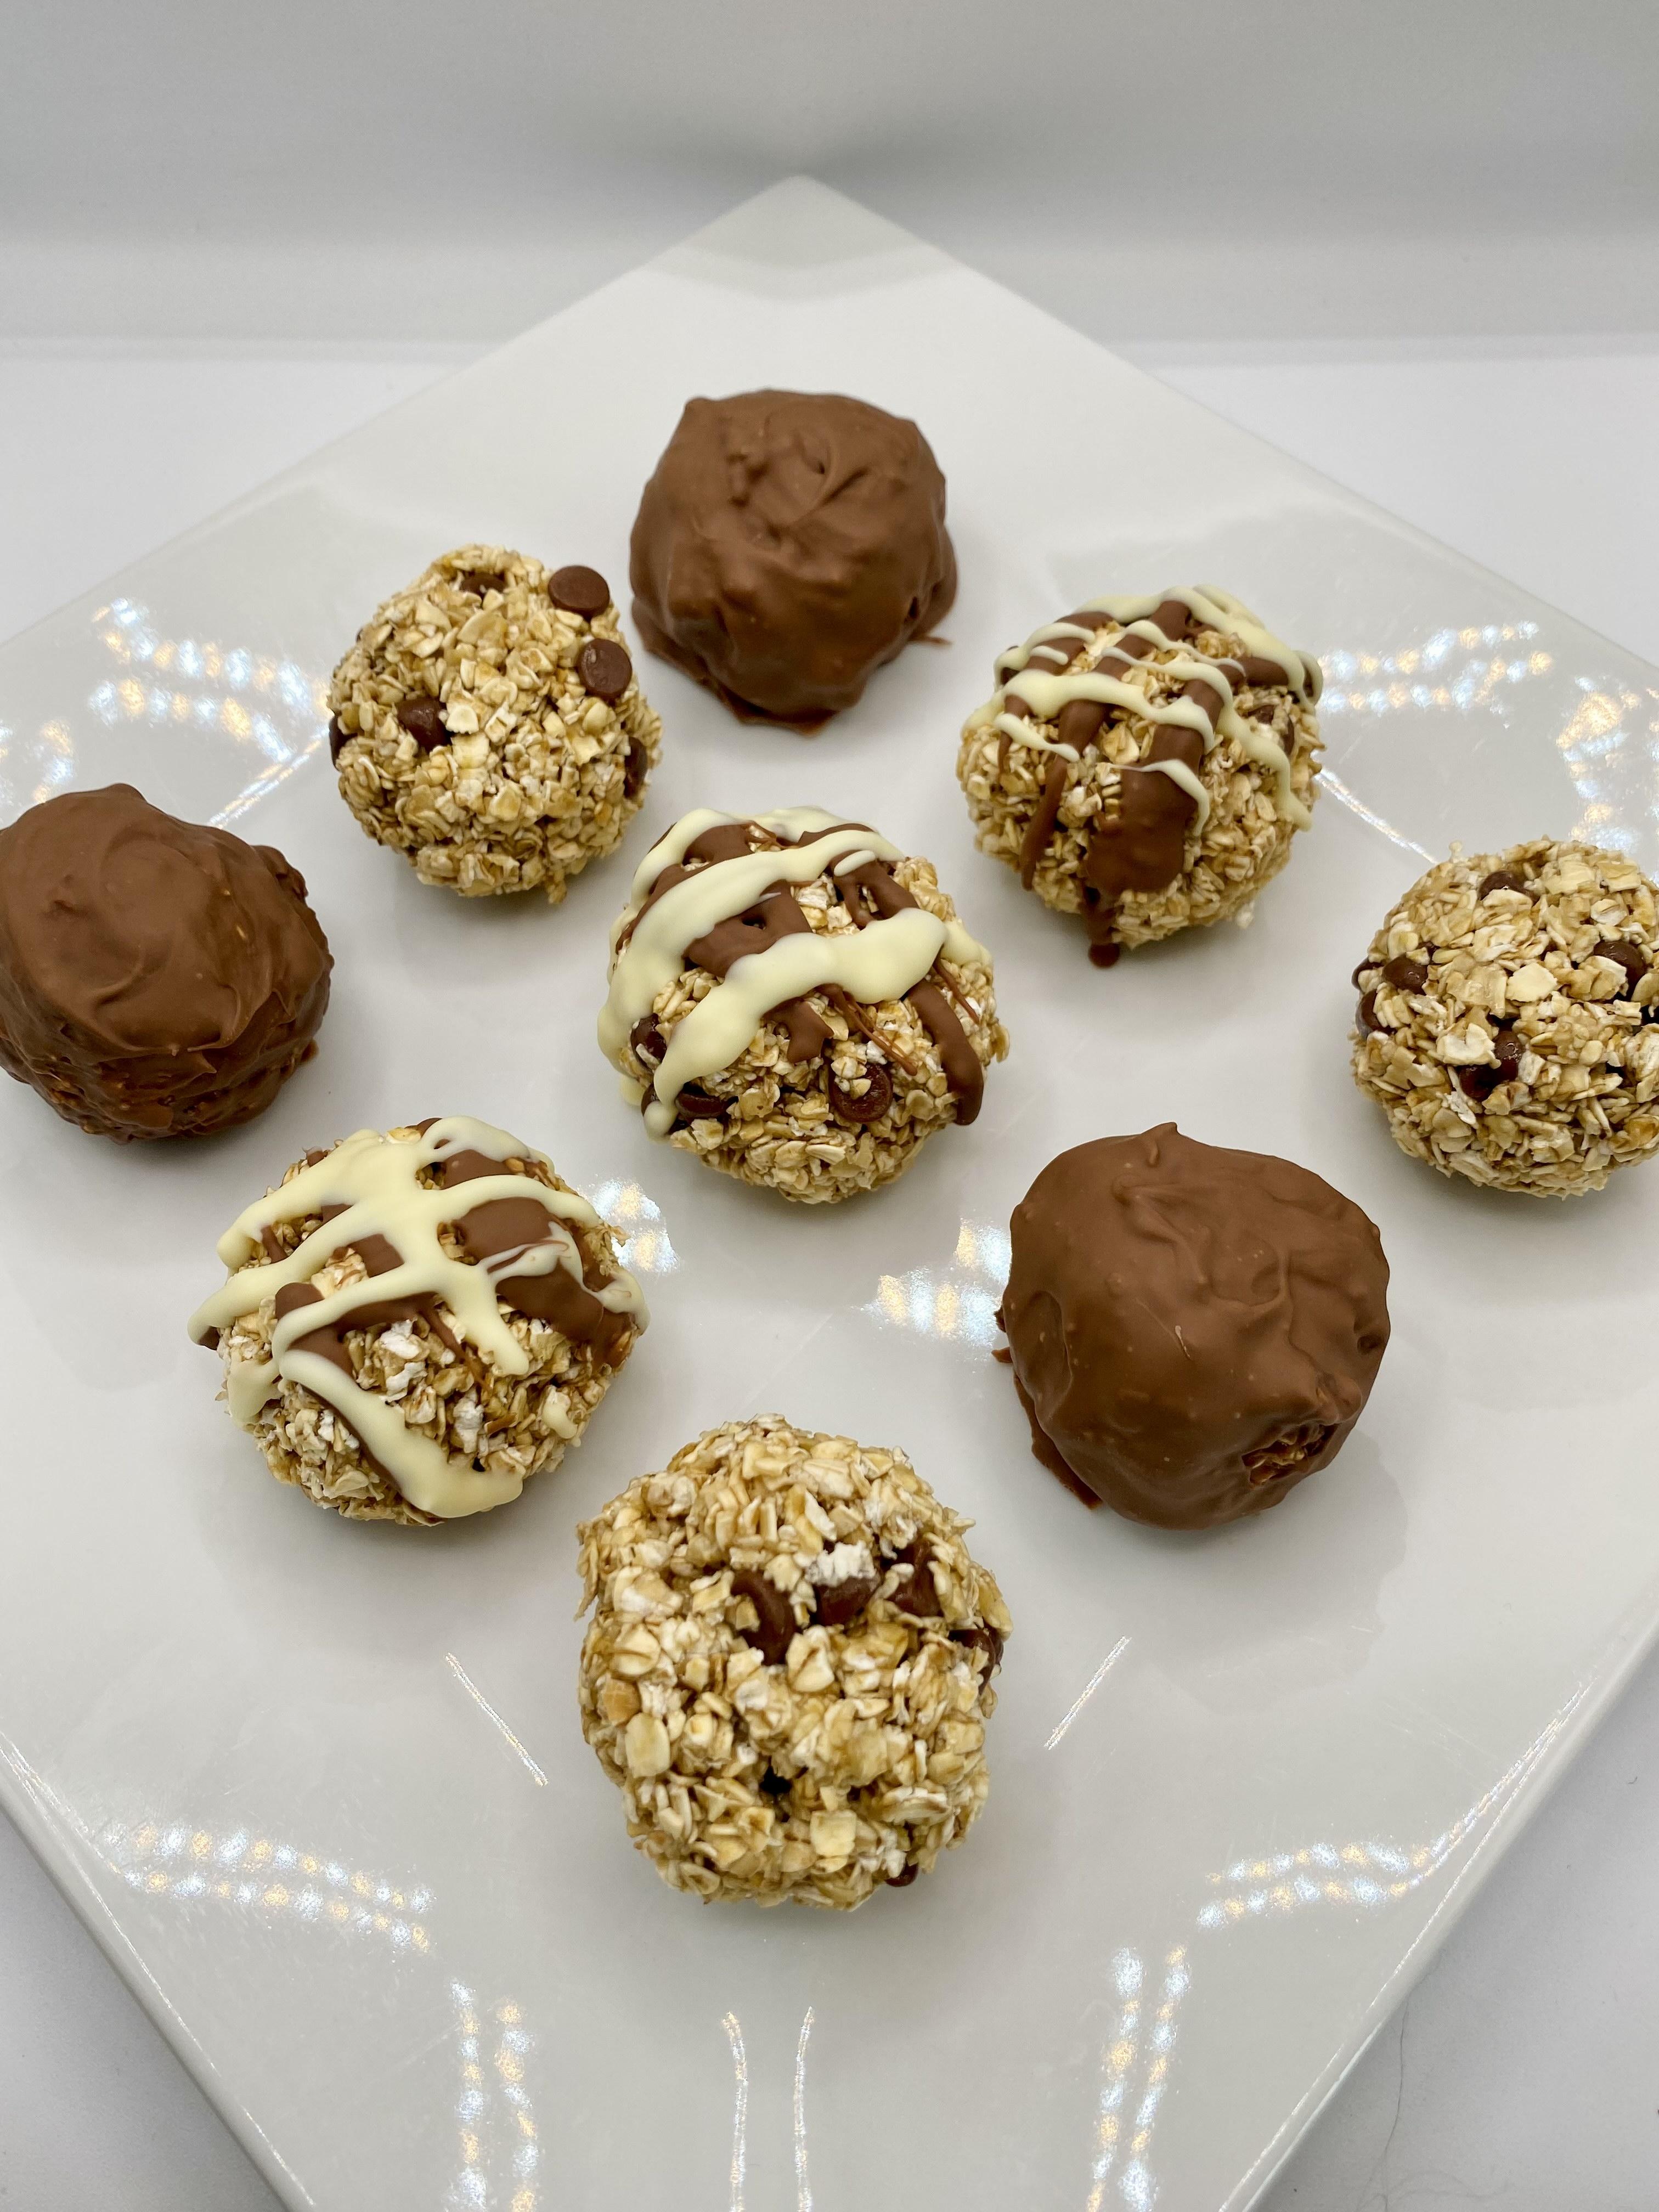 Triple chocolate protein balls